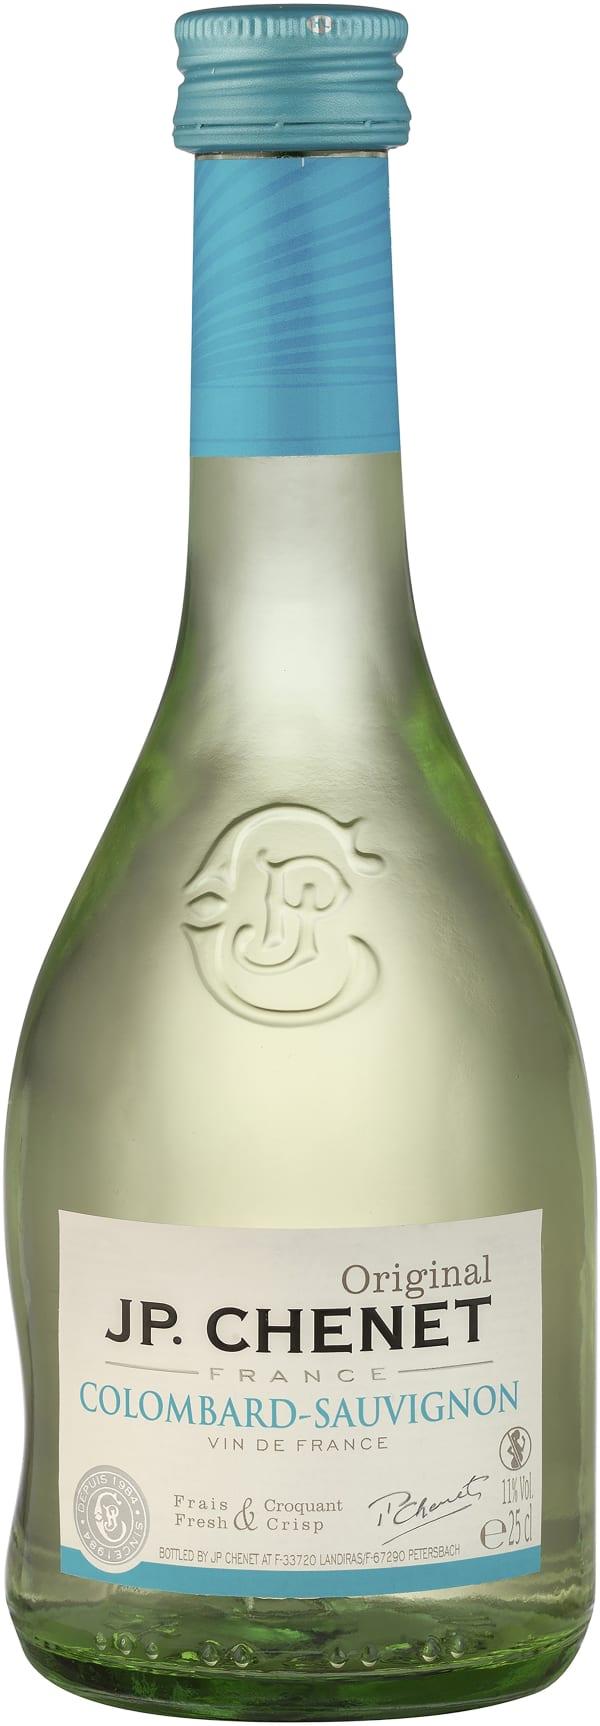 J.P. Chenet Colombard Chardonnay 2017